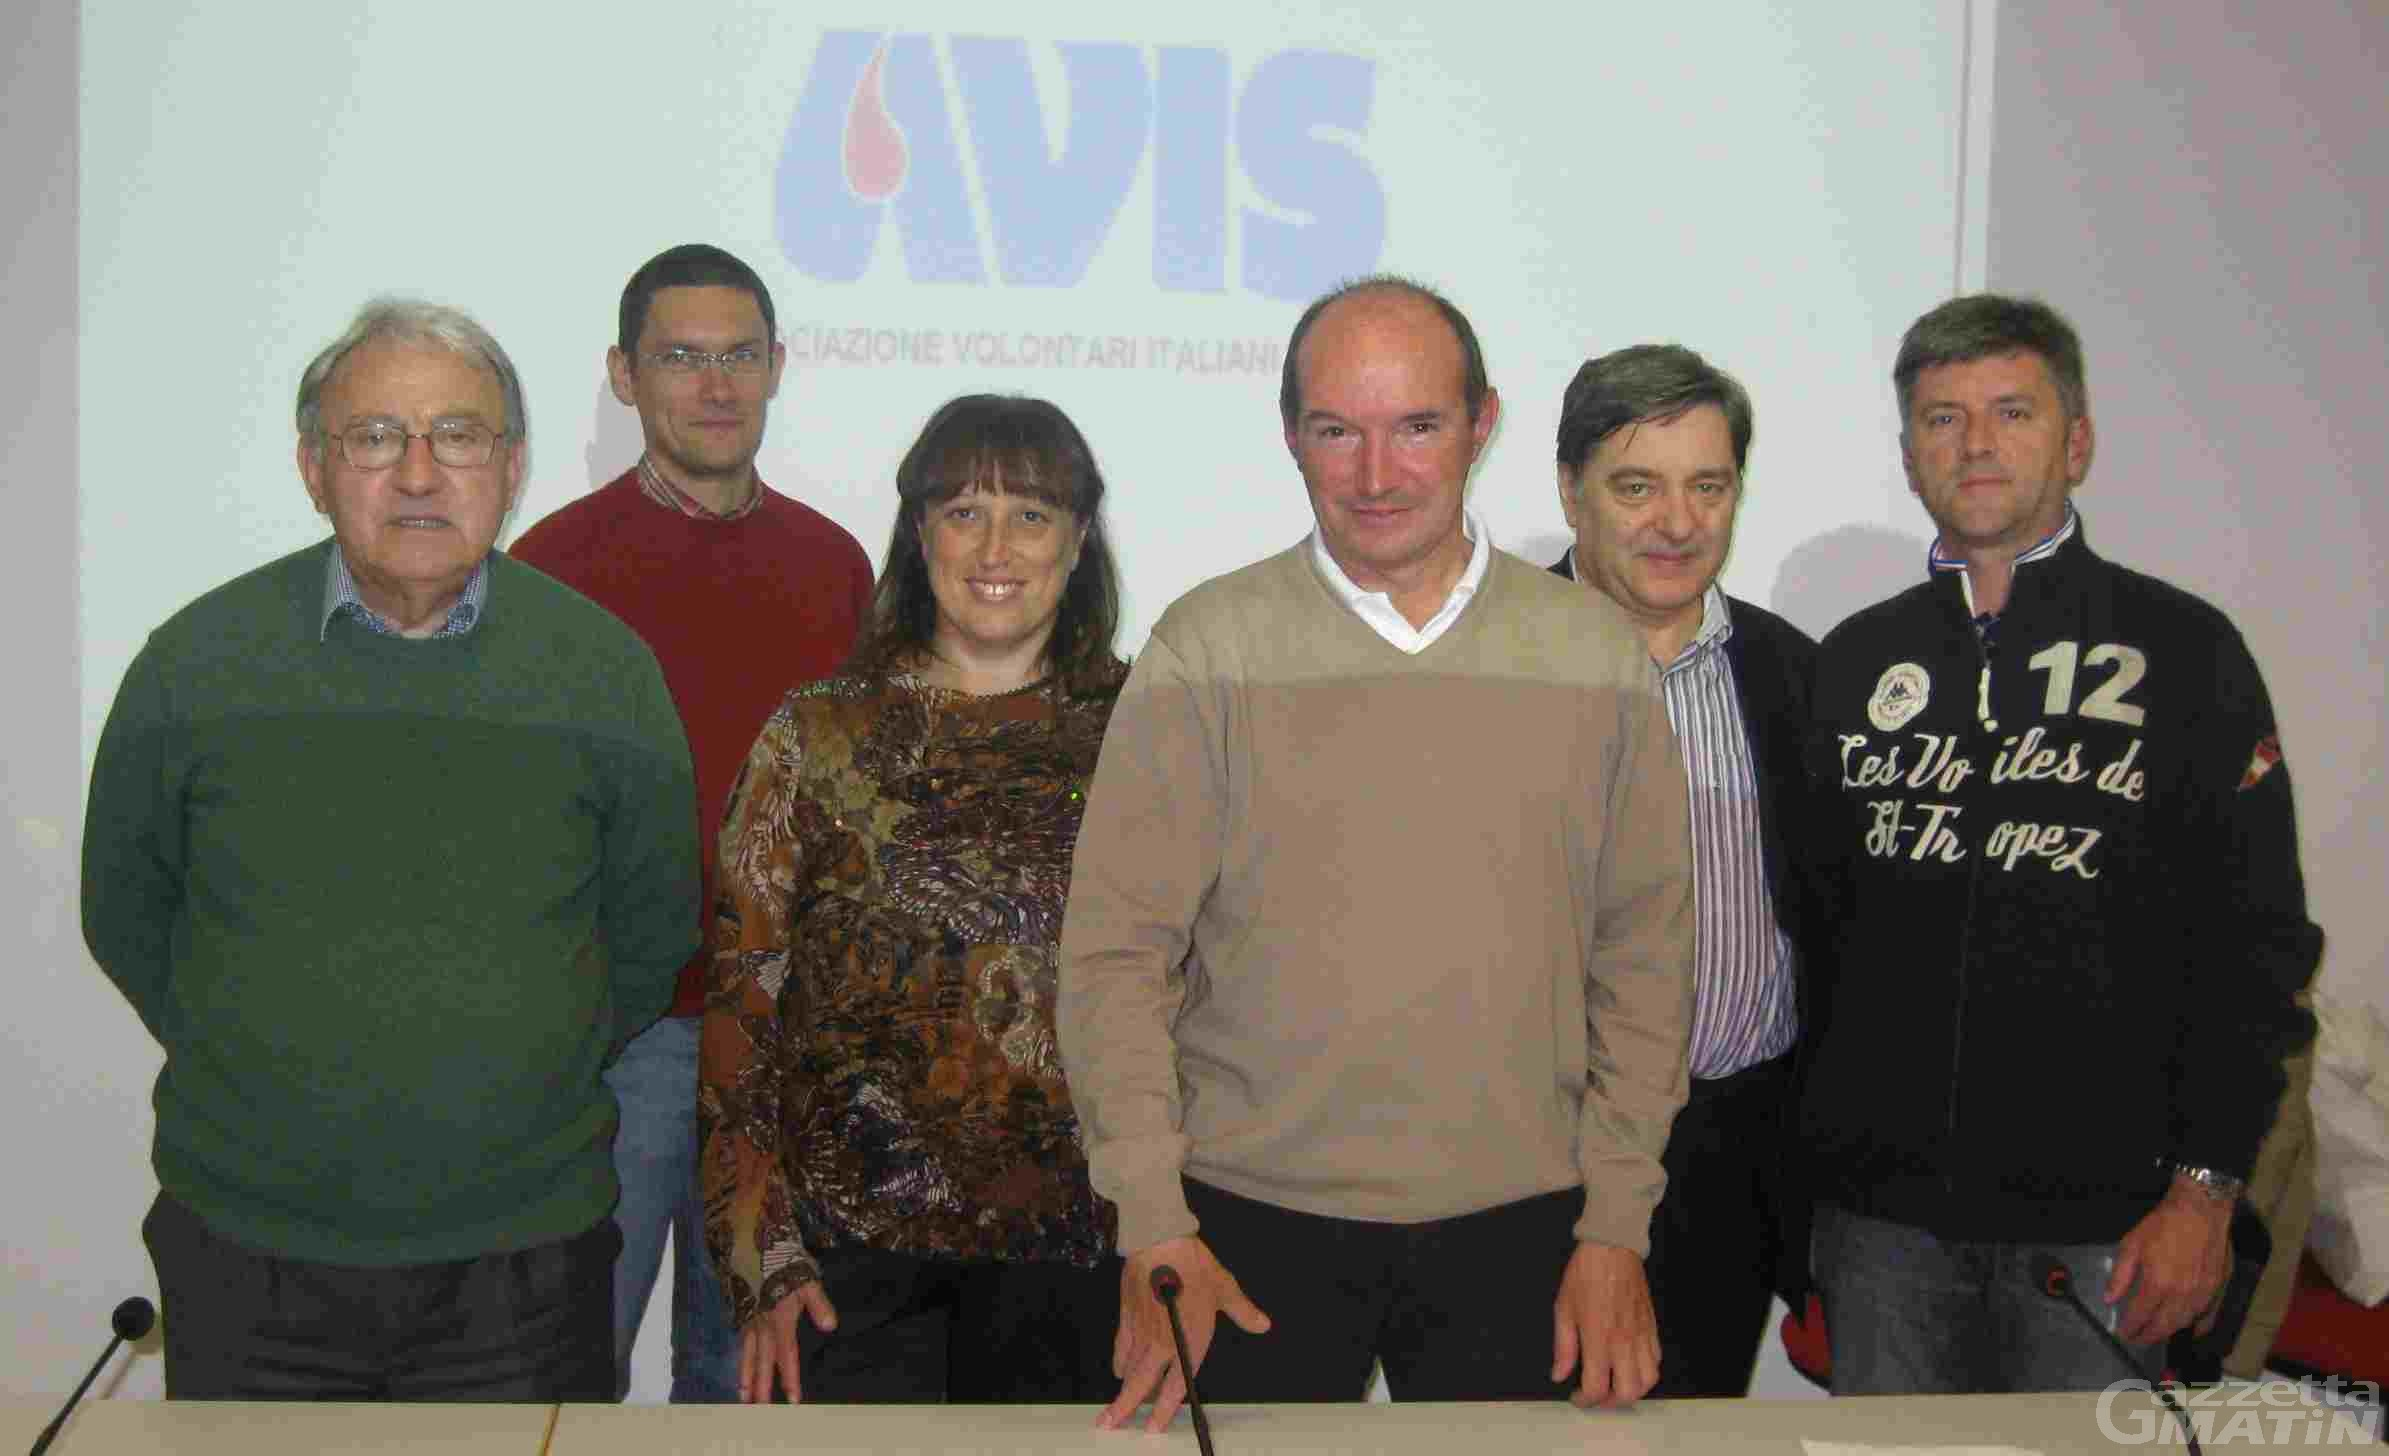 Avis: Civiero riconfermato presidente regionale